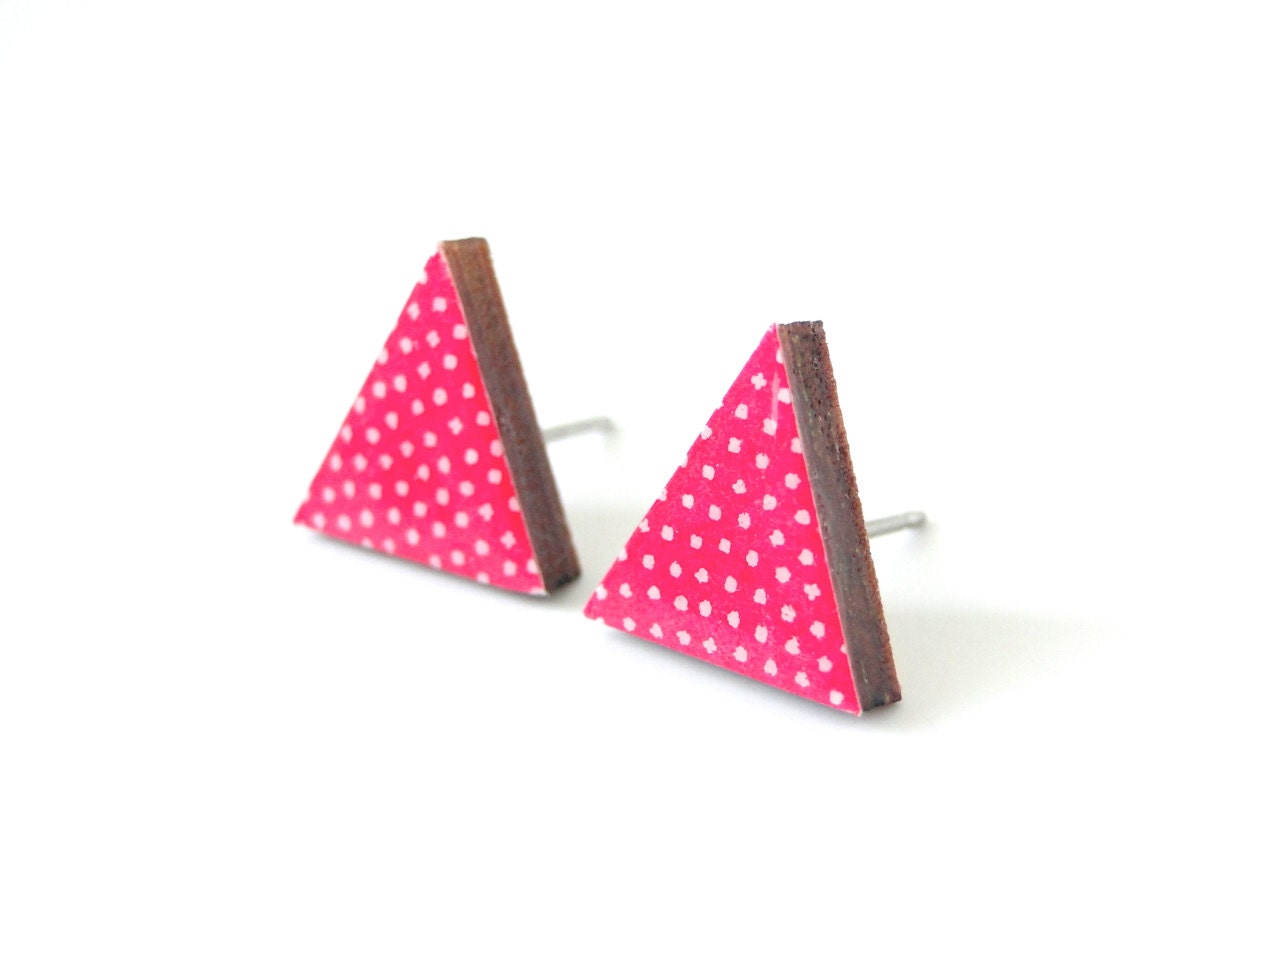 neon pink triangle stud earrings geometric earrings polka